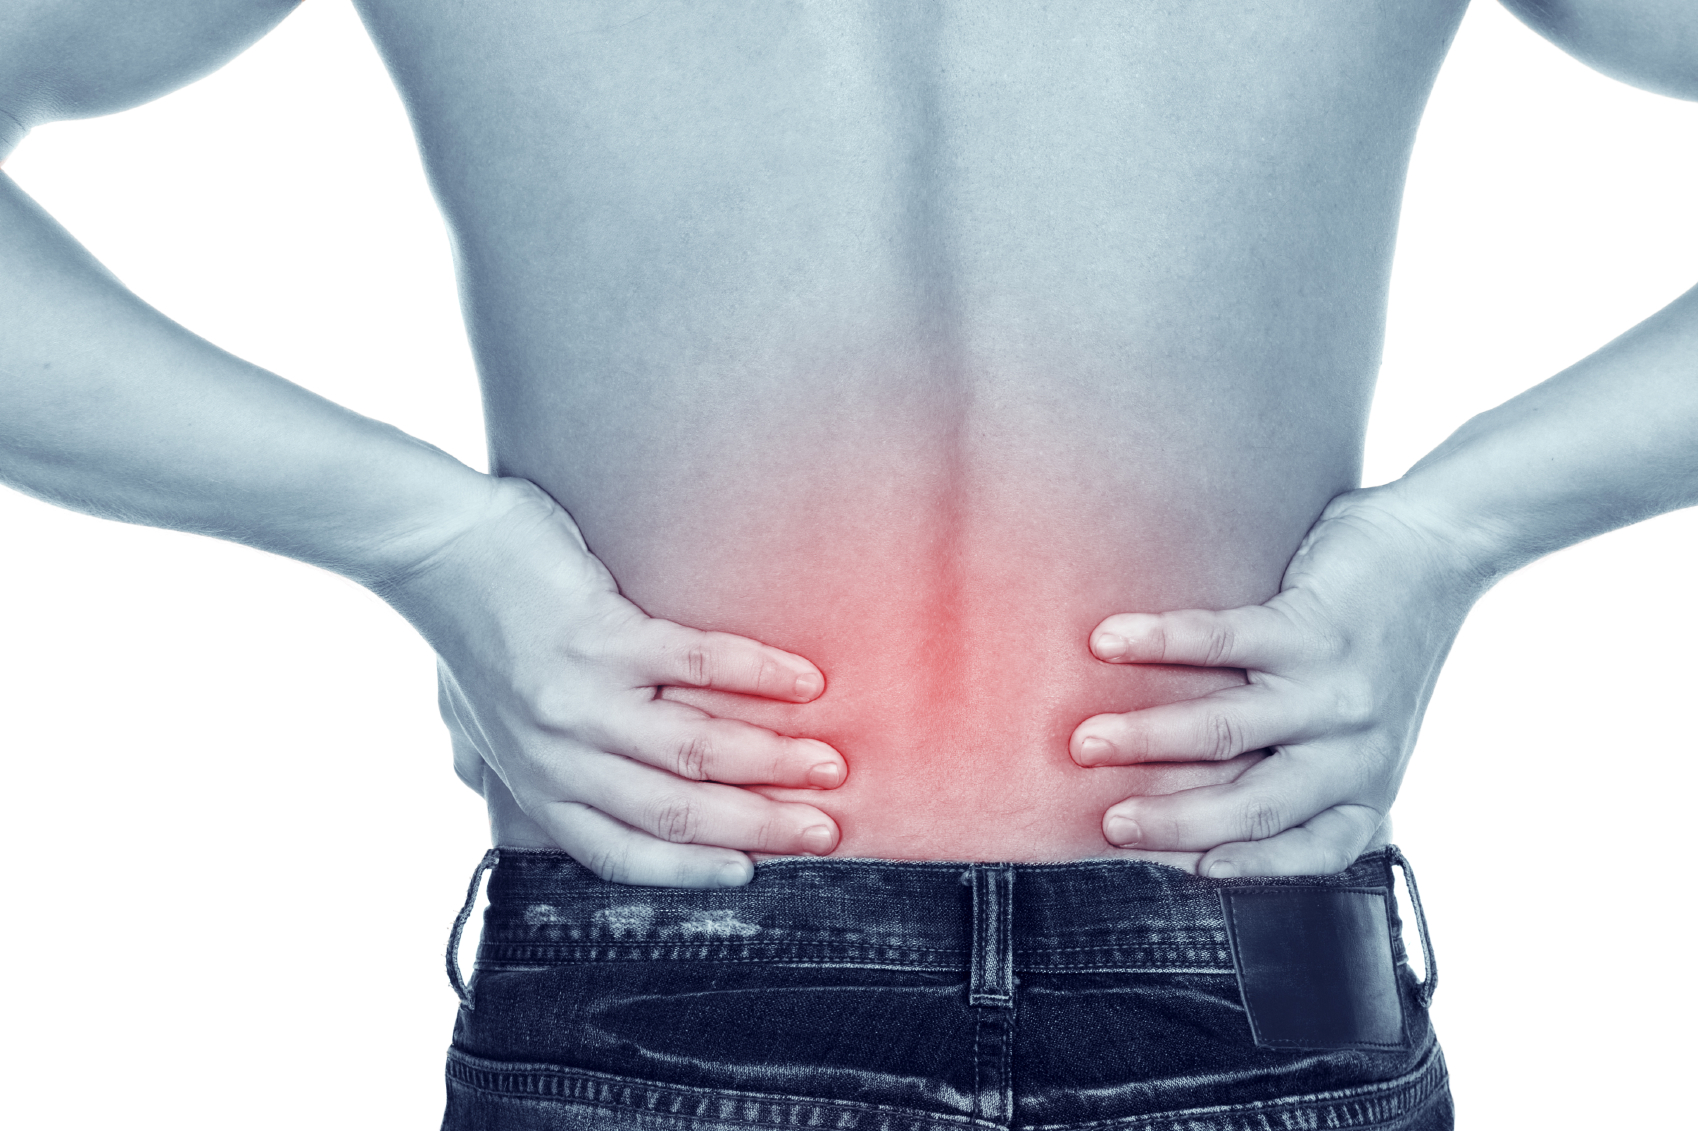 st-louis-lower-back-pain.jpg